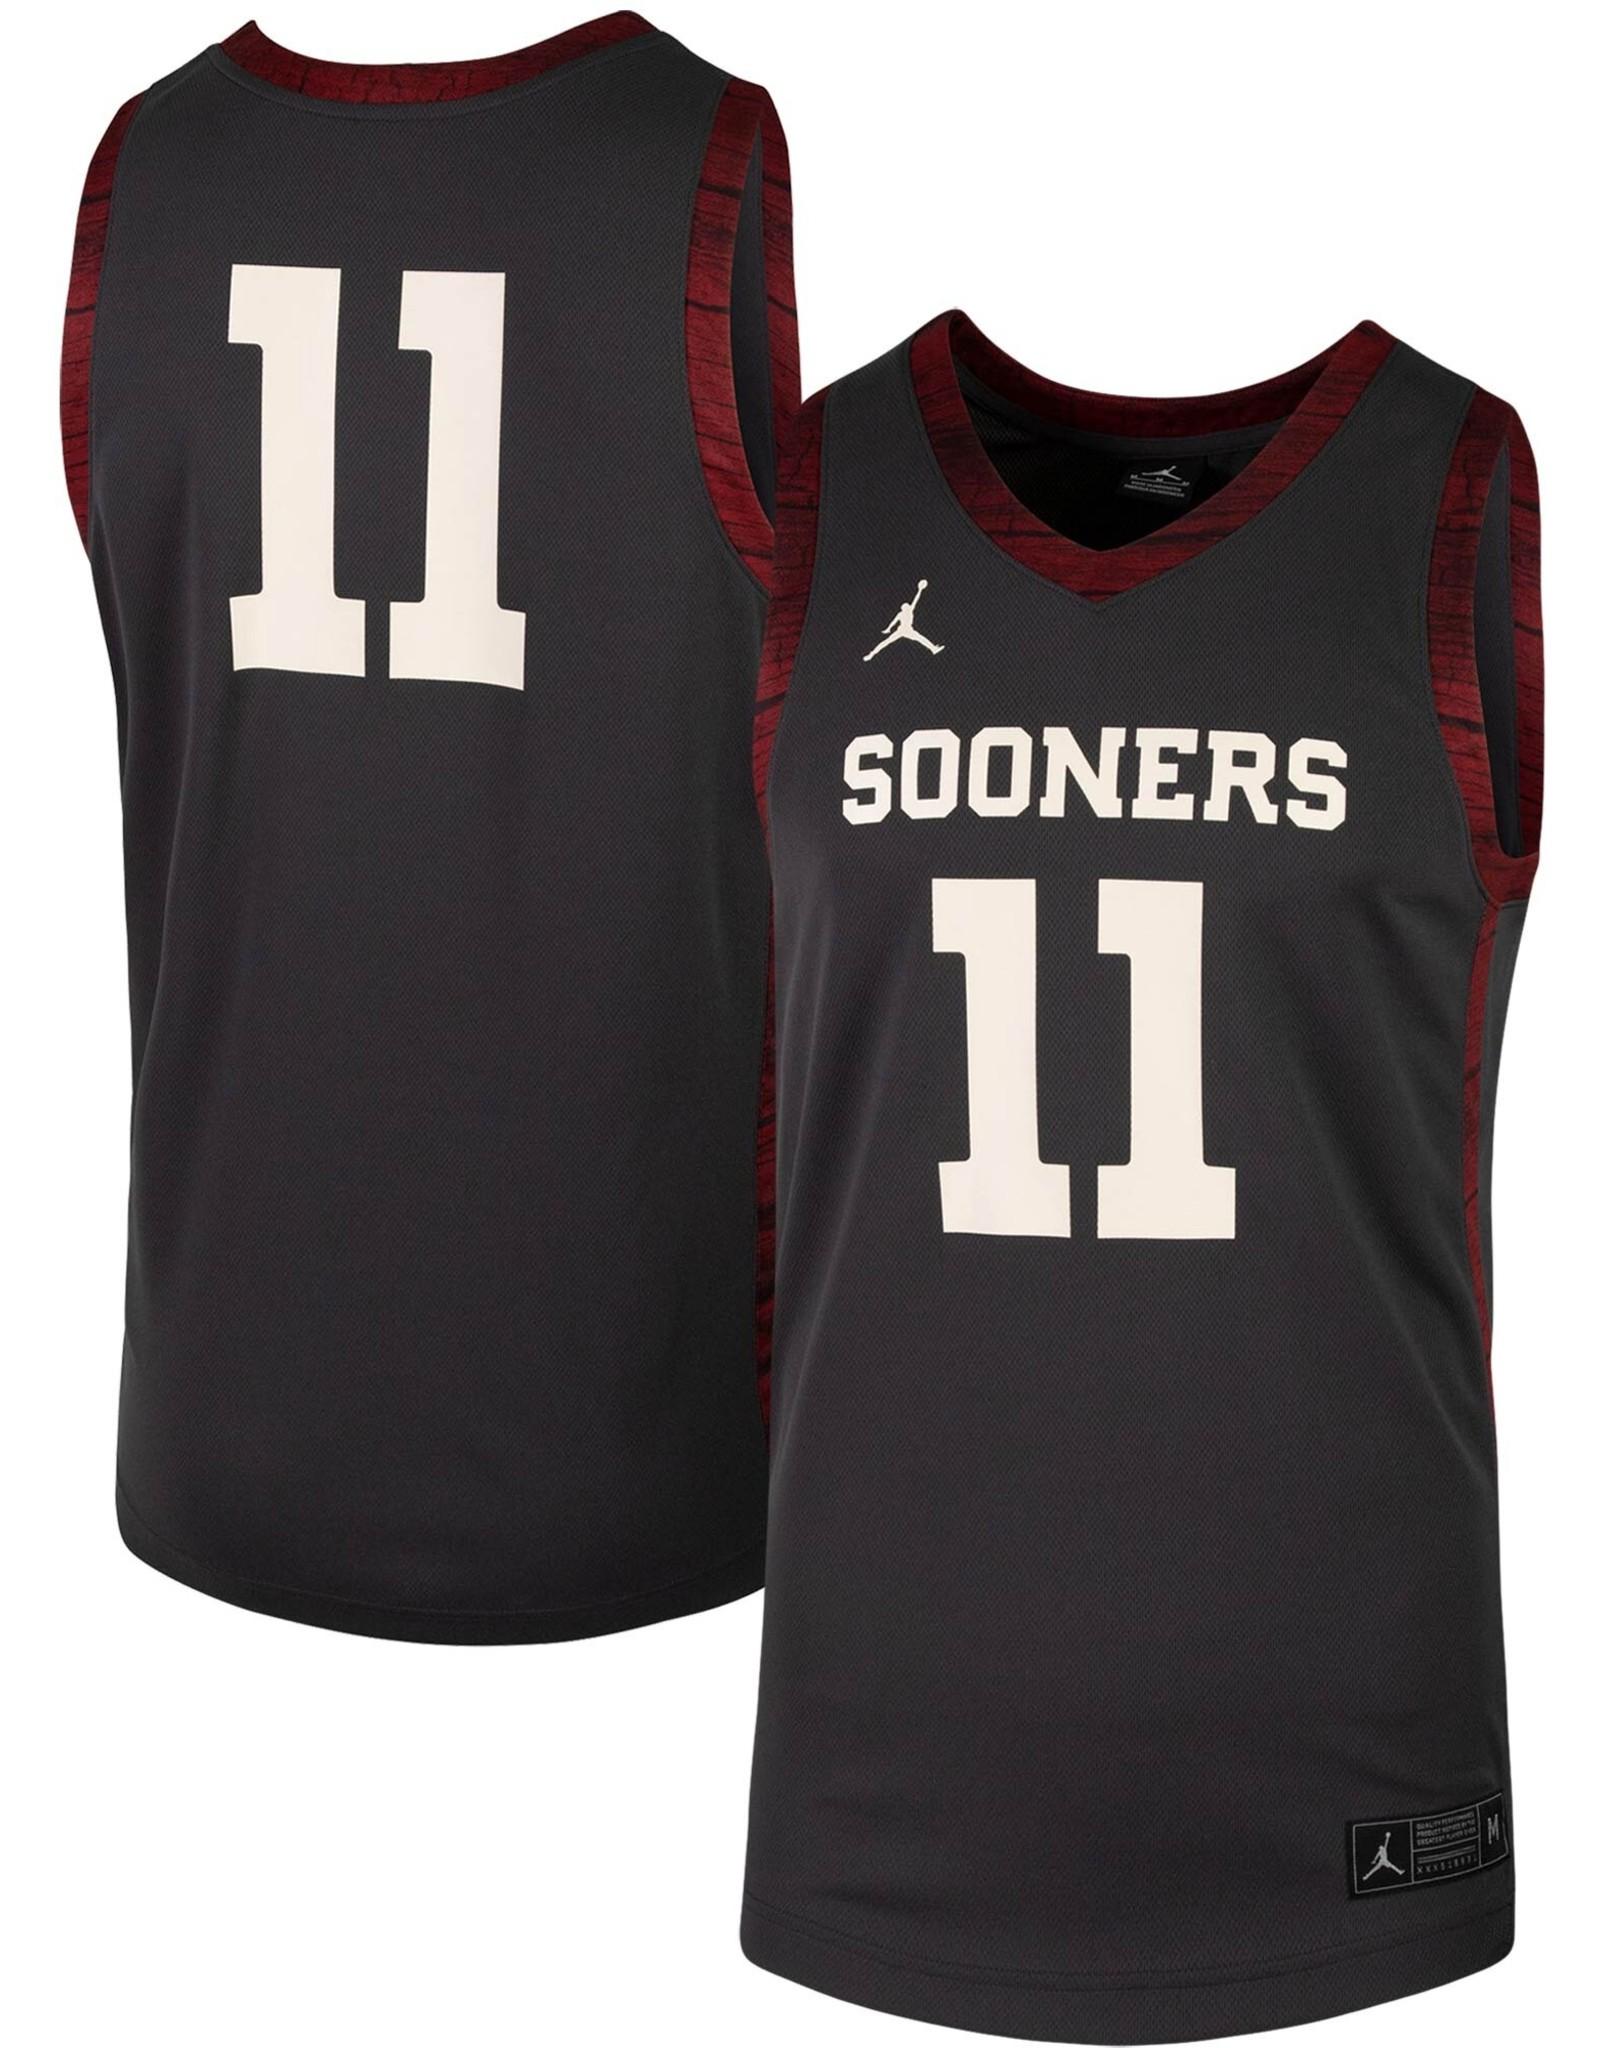 Jordan Men's Jordan Brand Alternative Basketball Jersey #11-Anthracite